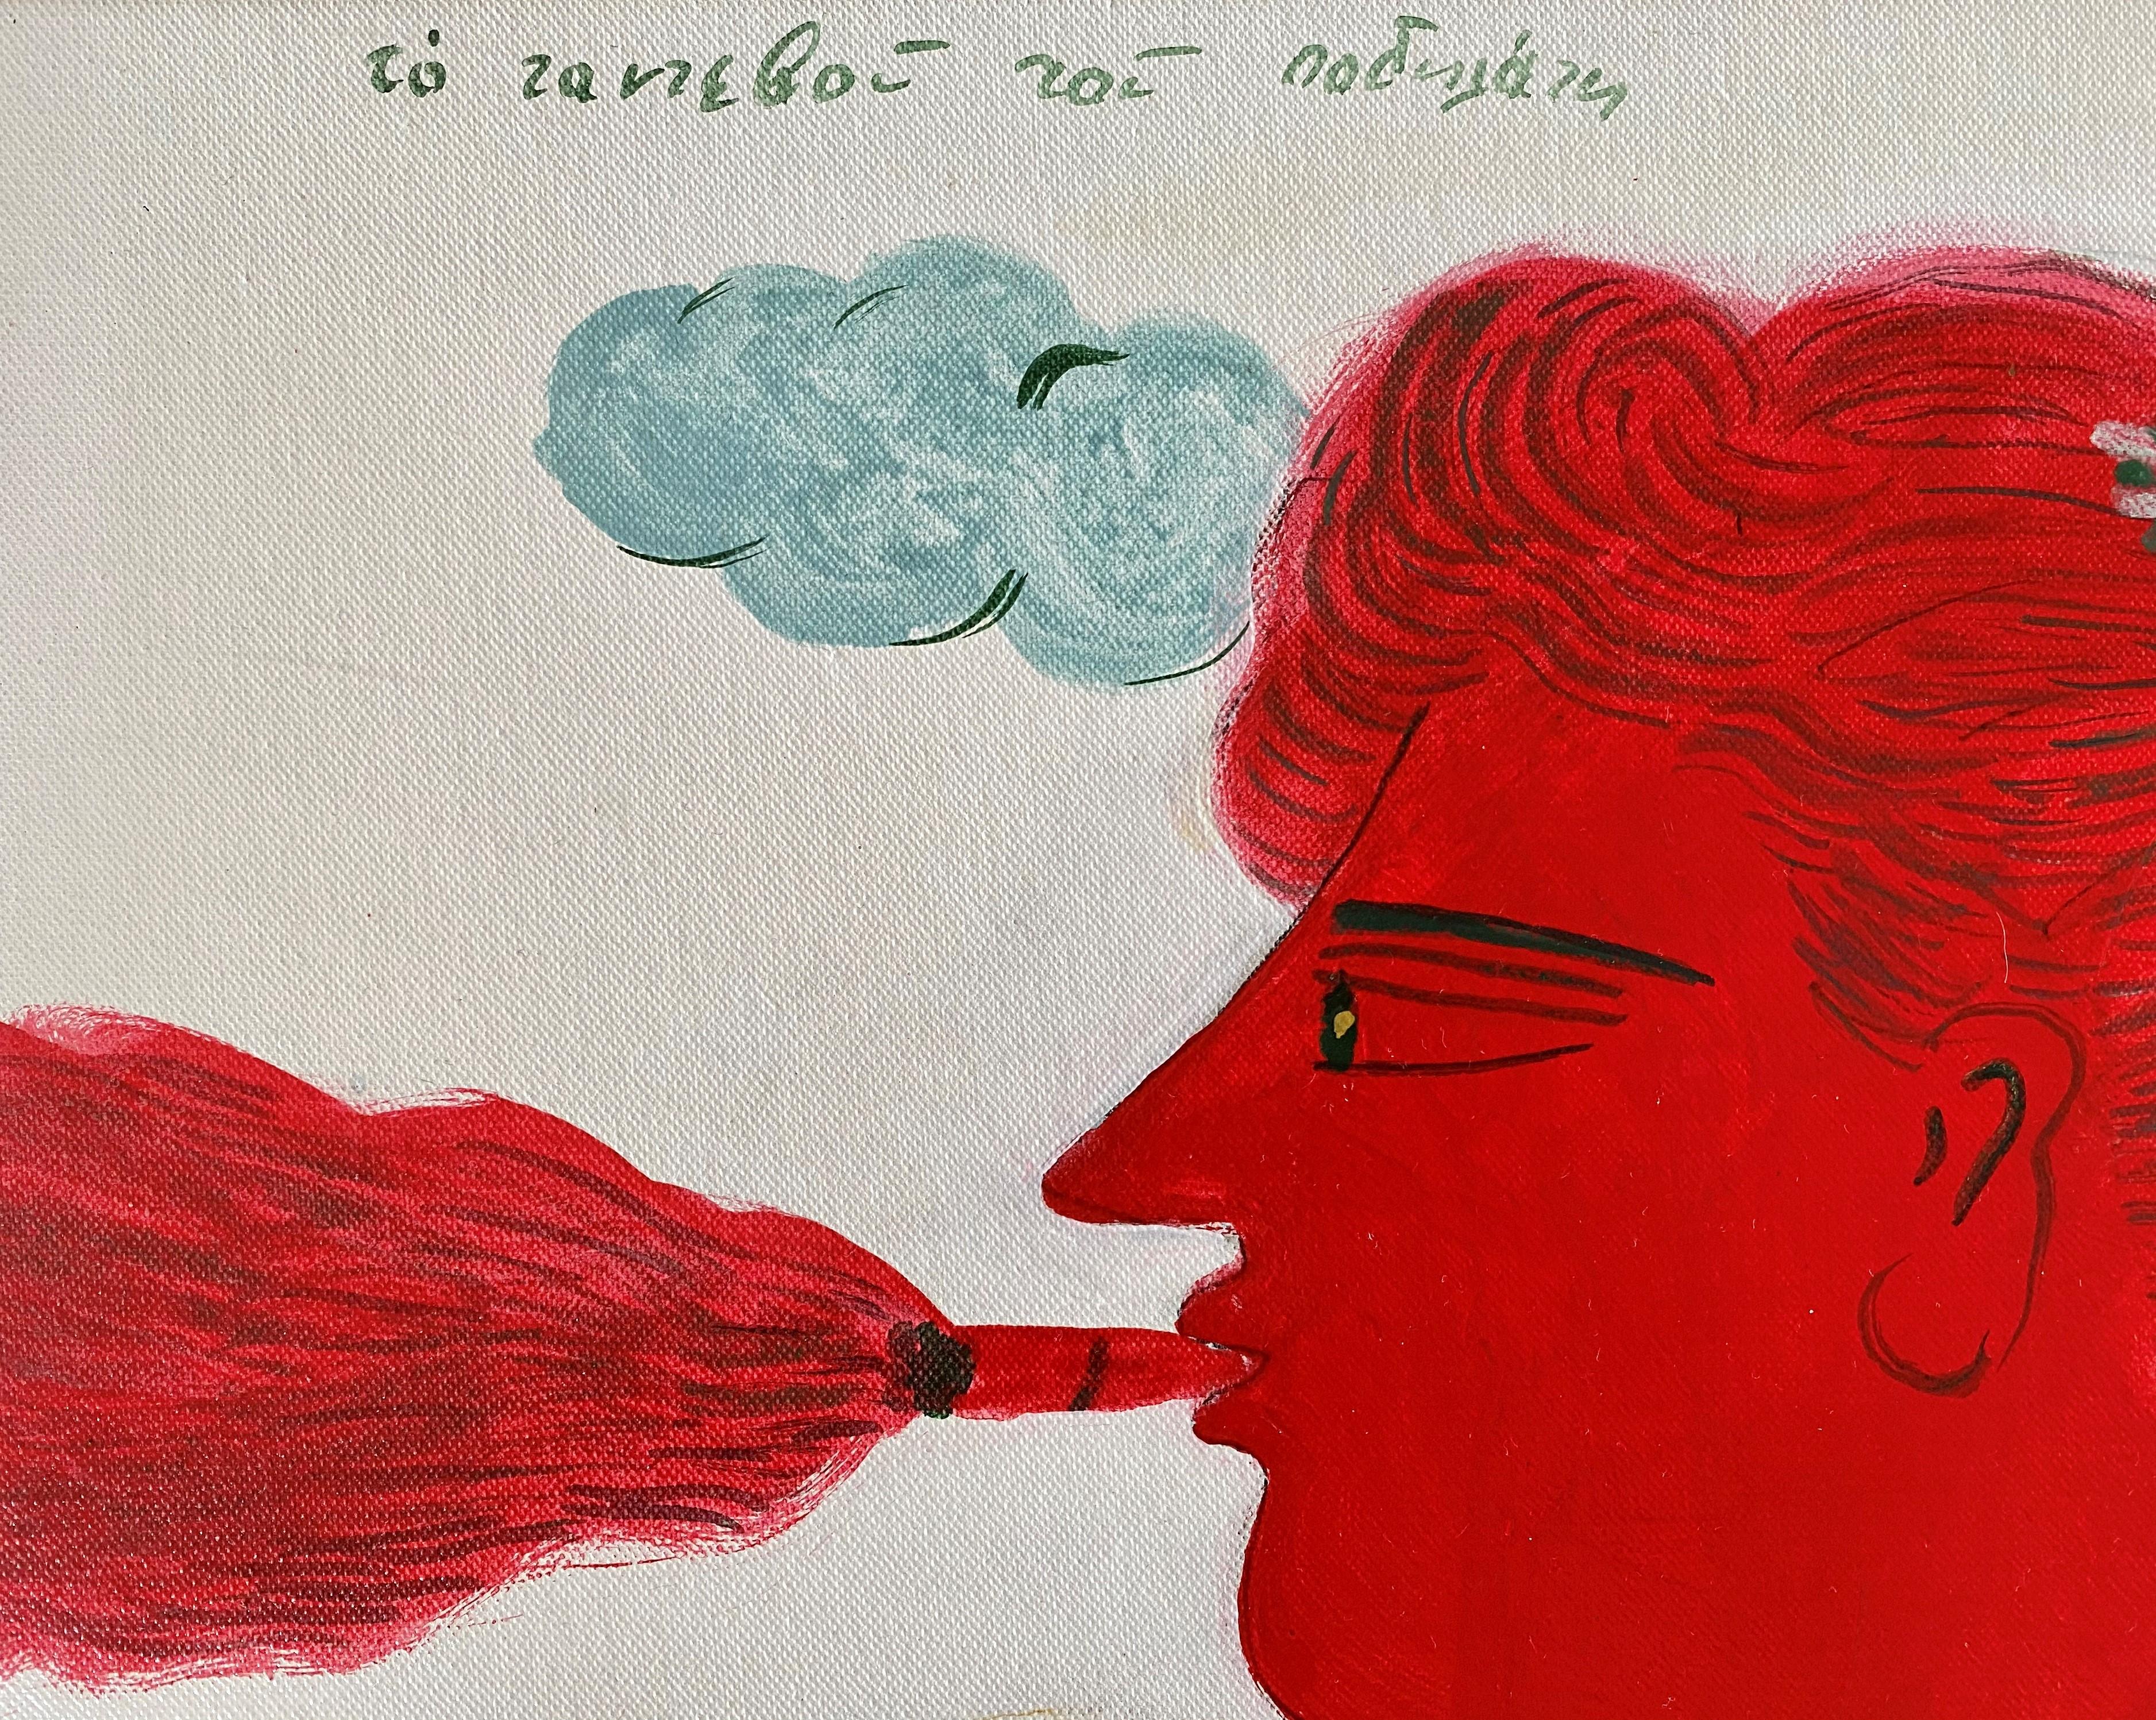 Alekos Fassianos (Greek, born 1935) (AR), The Cyclist's Rendezvous, 74 x 49 cm - Image 3 of 3